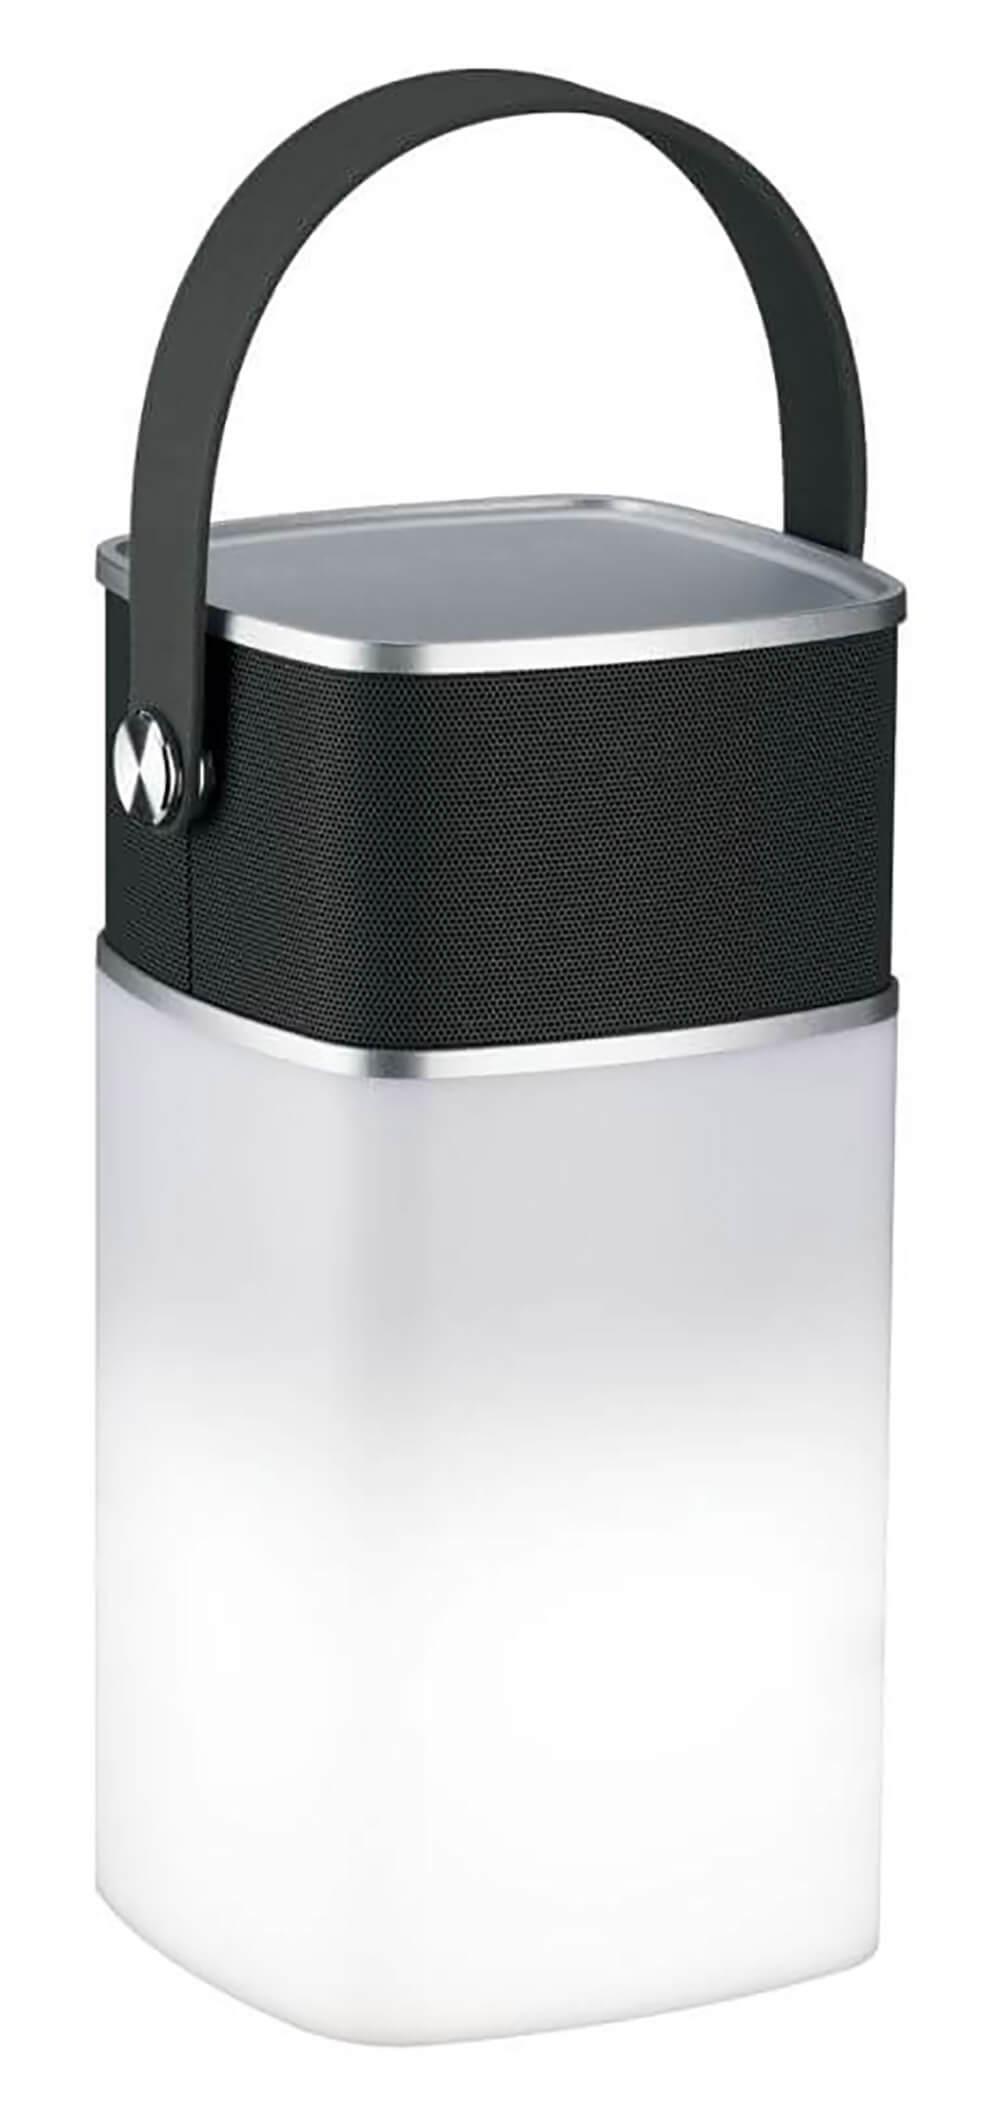 paulmann mobile tischleuchte clutch sound ip44 dimmbar. Black Bedroom Furniture Sets. Home Design Ideas